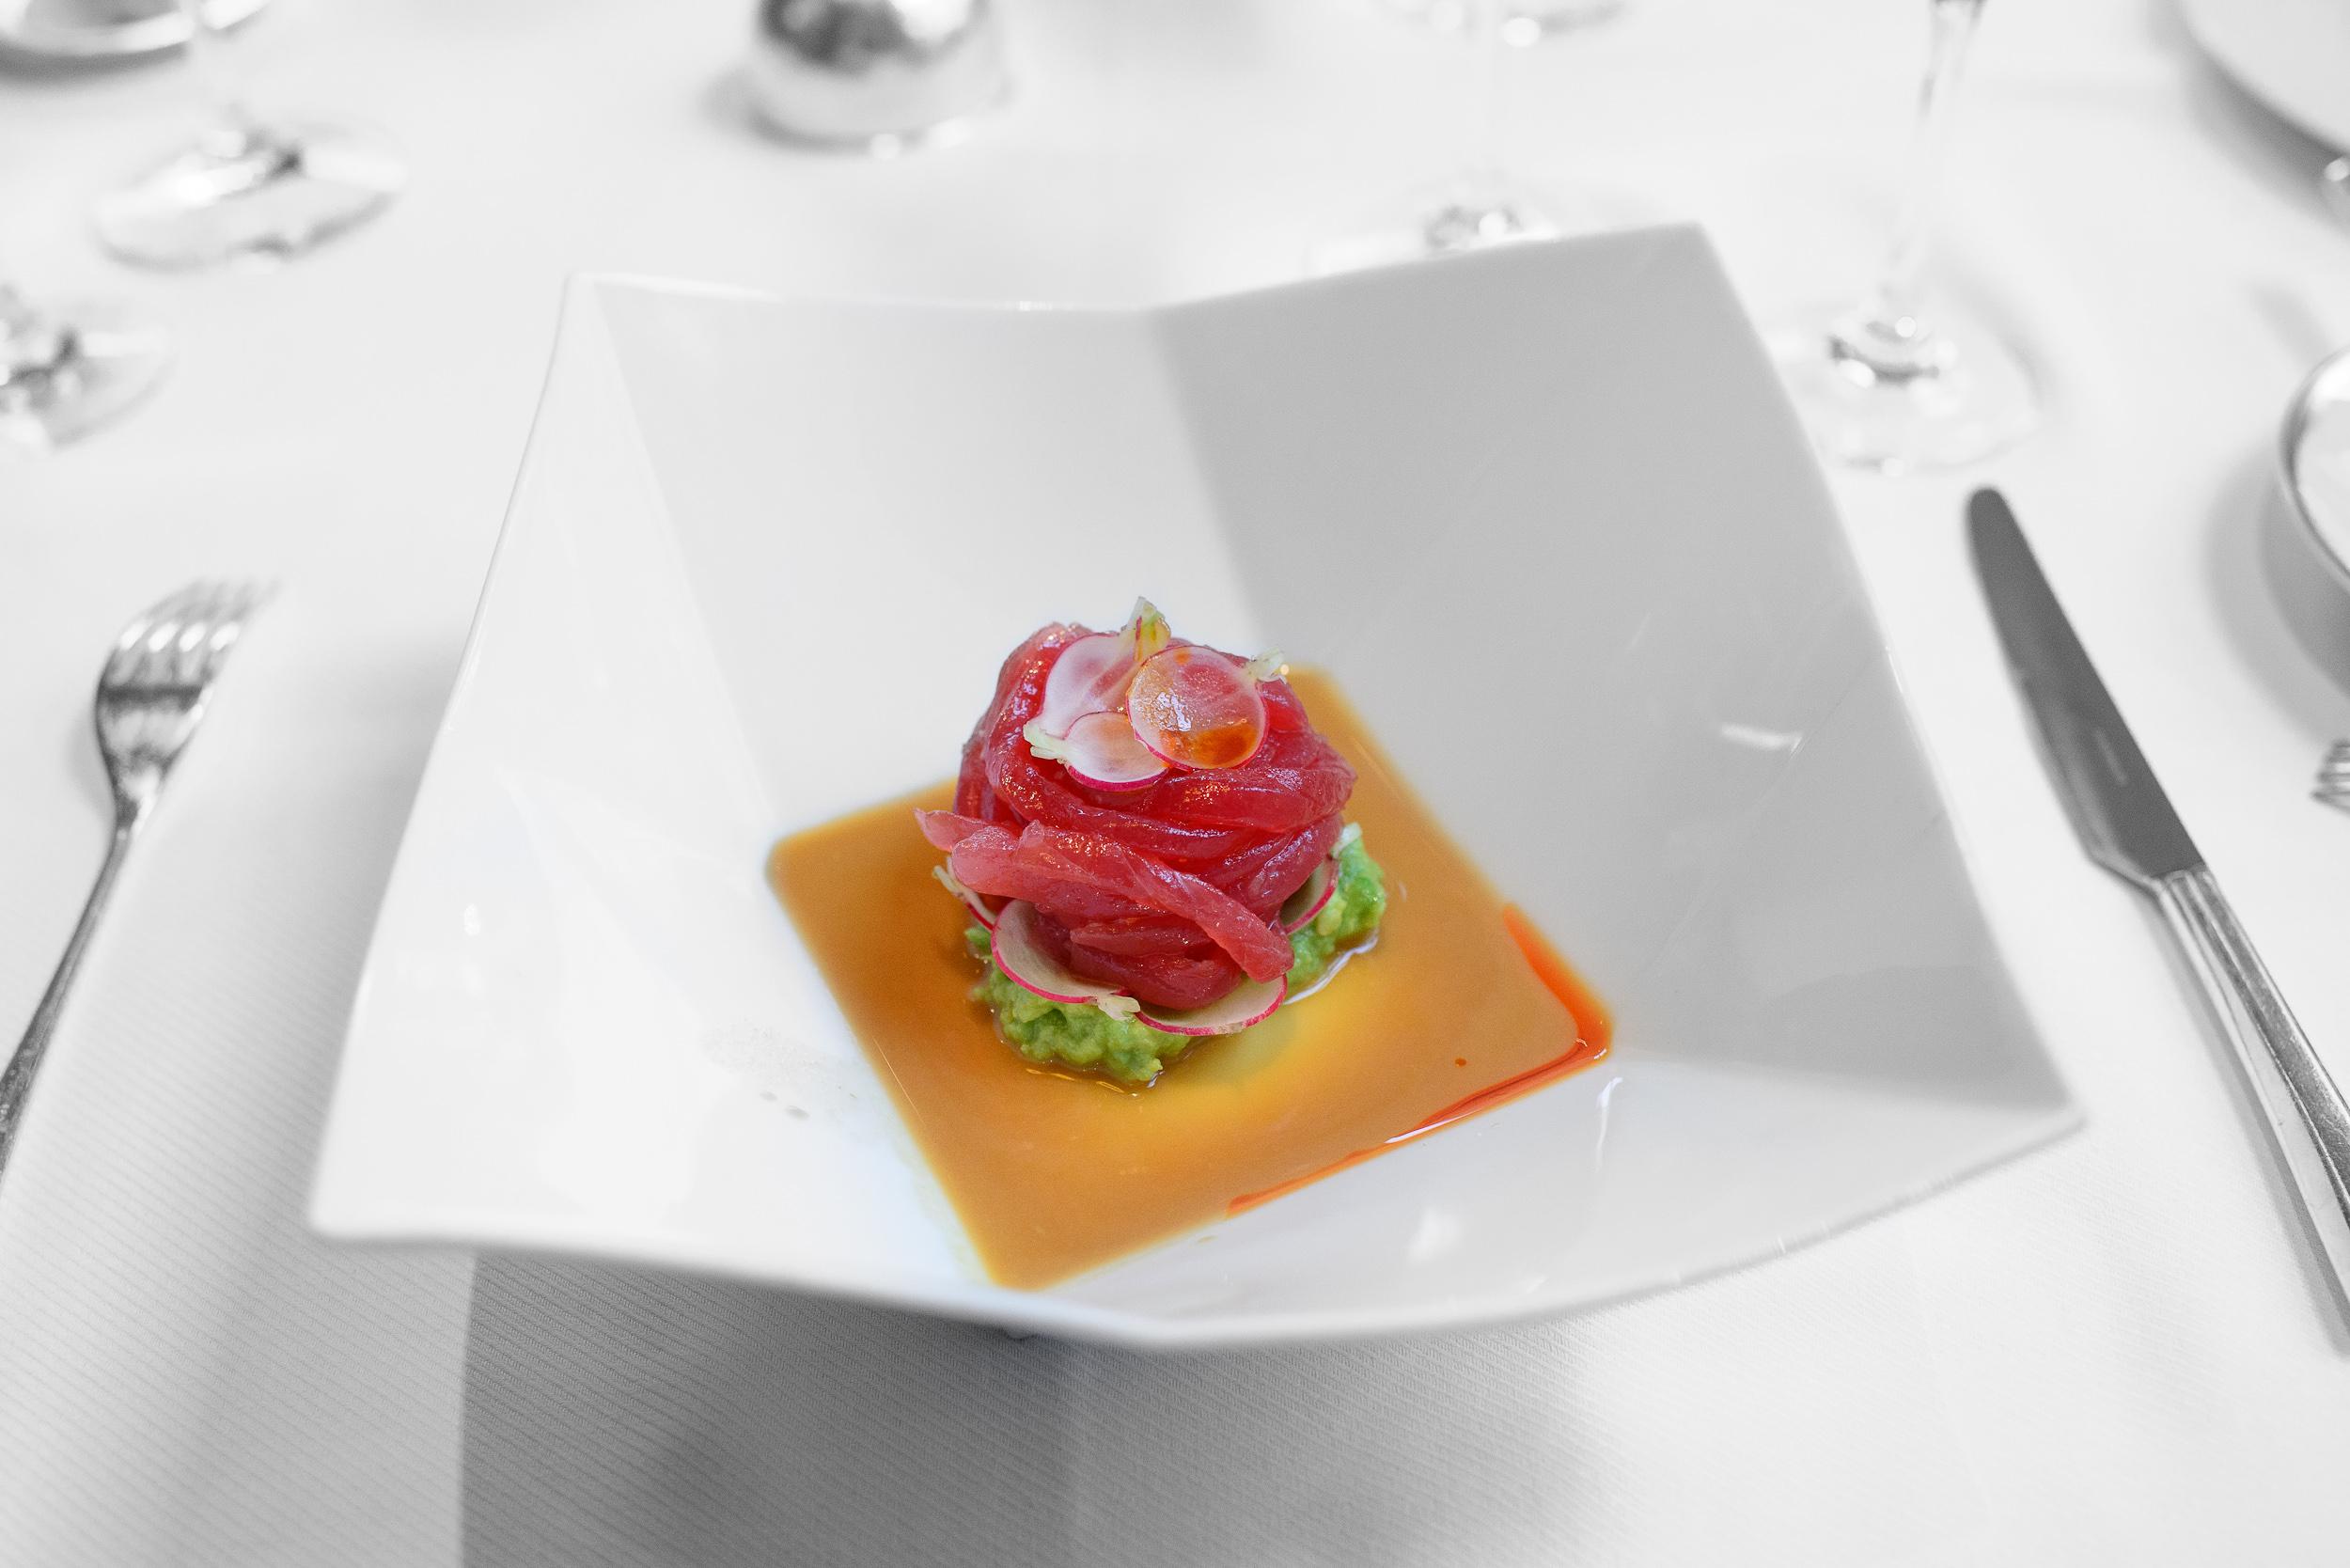 Yellowfin tuna ribbons, avocado, and spicy radish with ginger ma